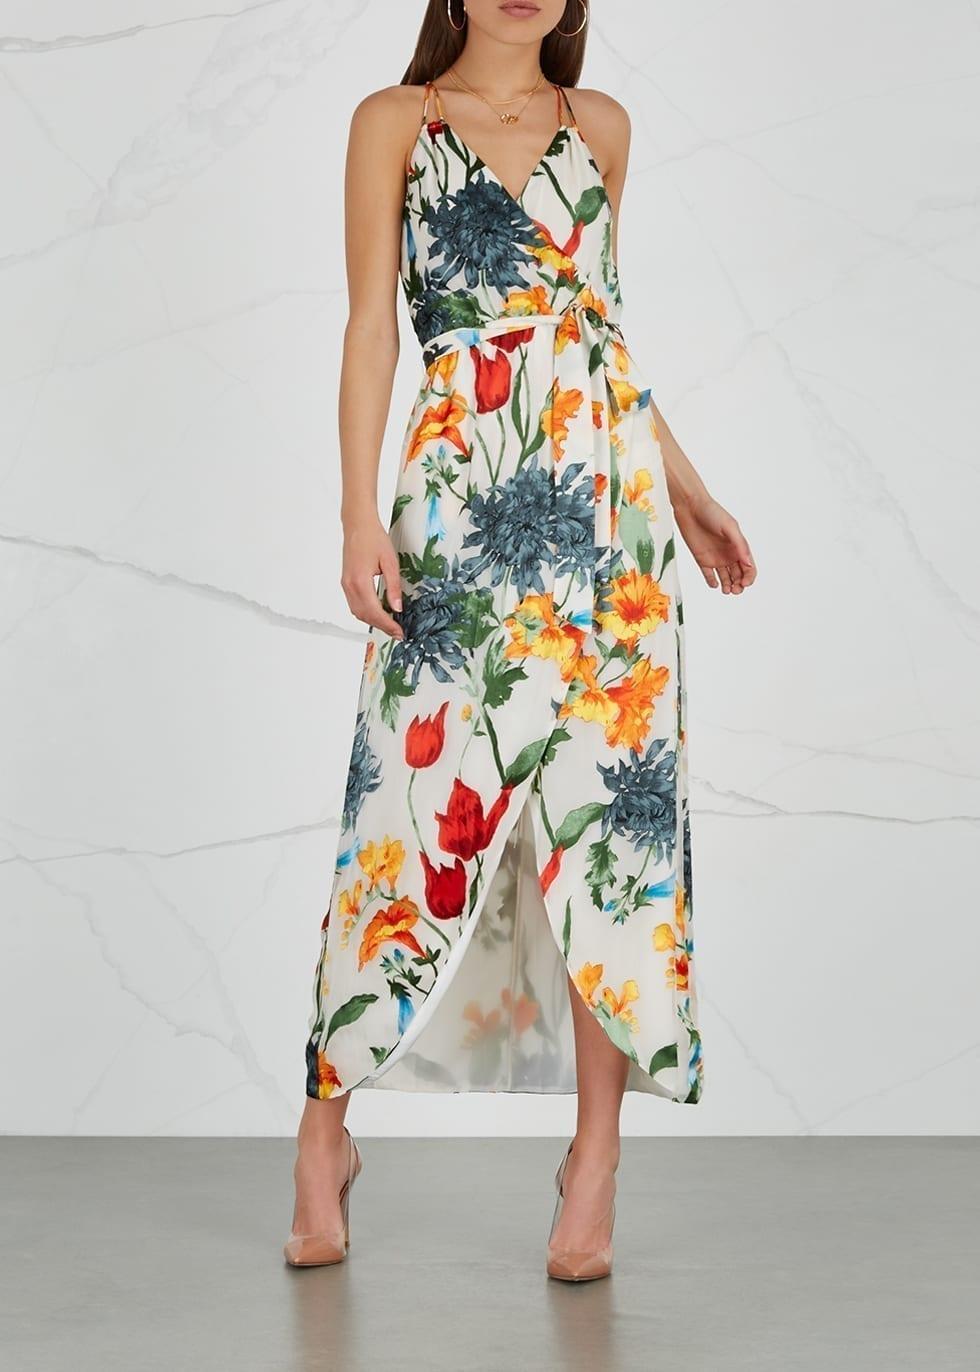 ALICE + OLIVIA Susana Devoré Chiffon Multi / Floral Printed Dress